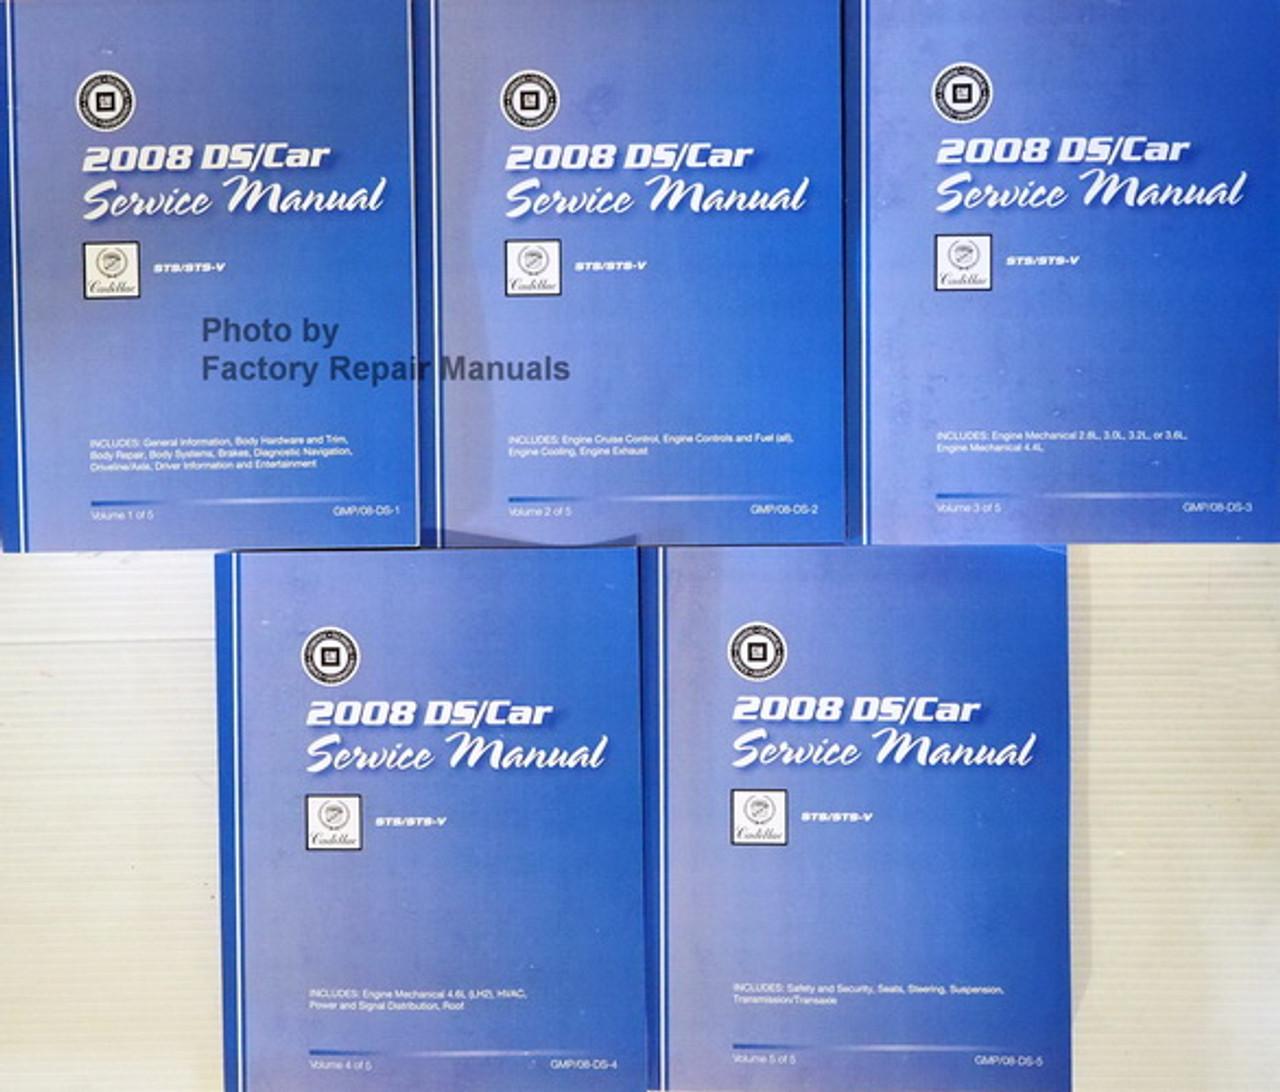 2008 Cadillac Sts    Sts-v Factory Shop Service Manual 5 Volume Set